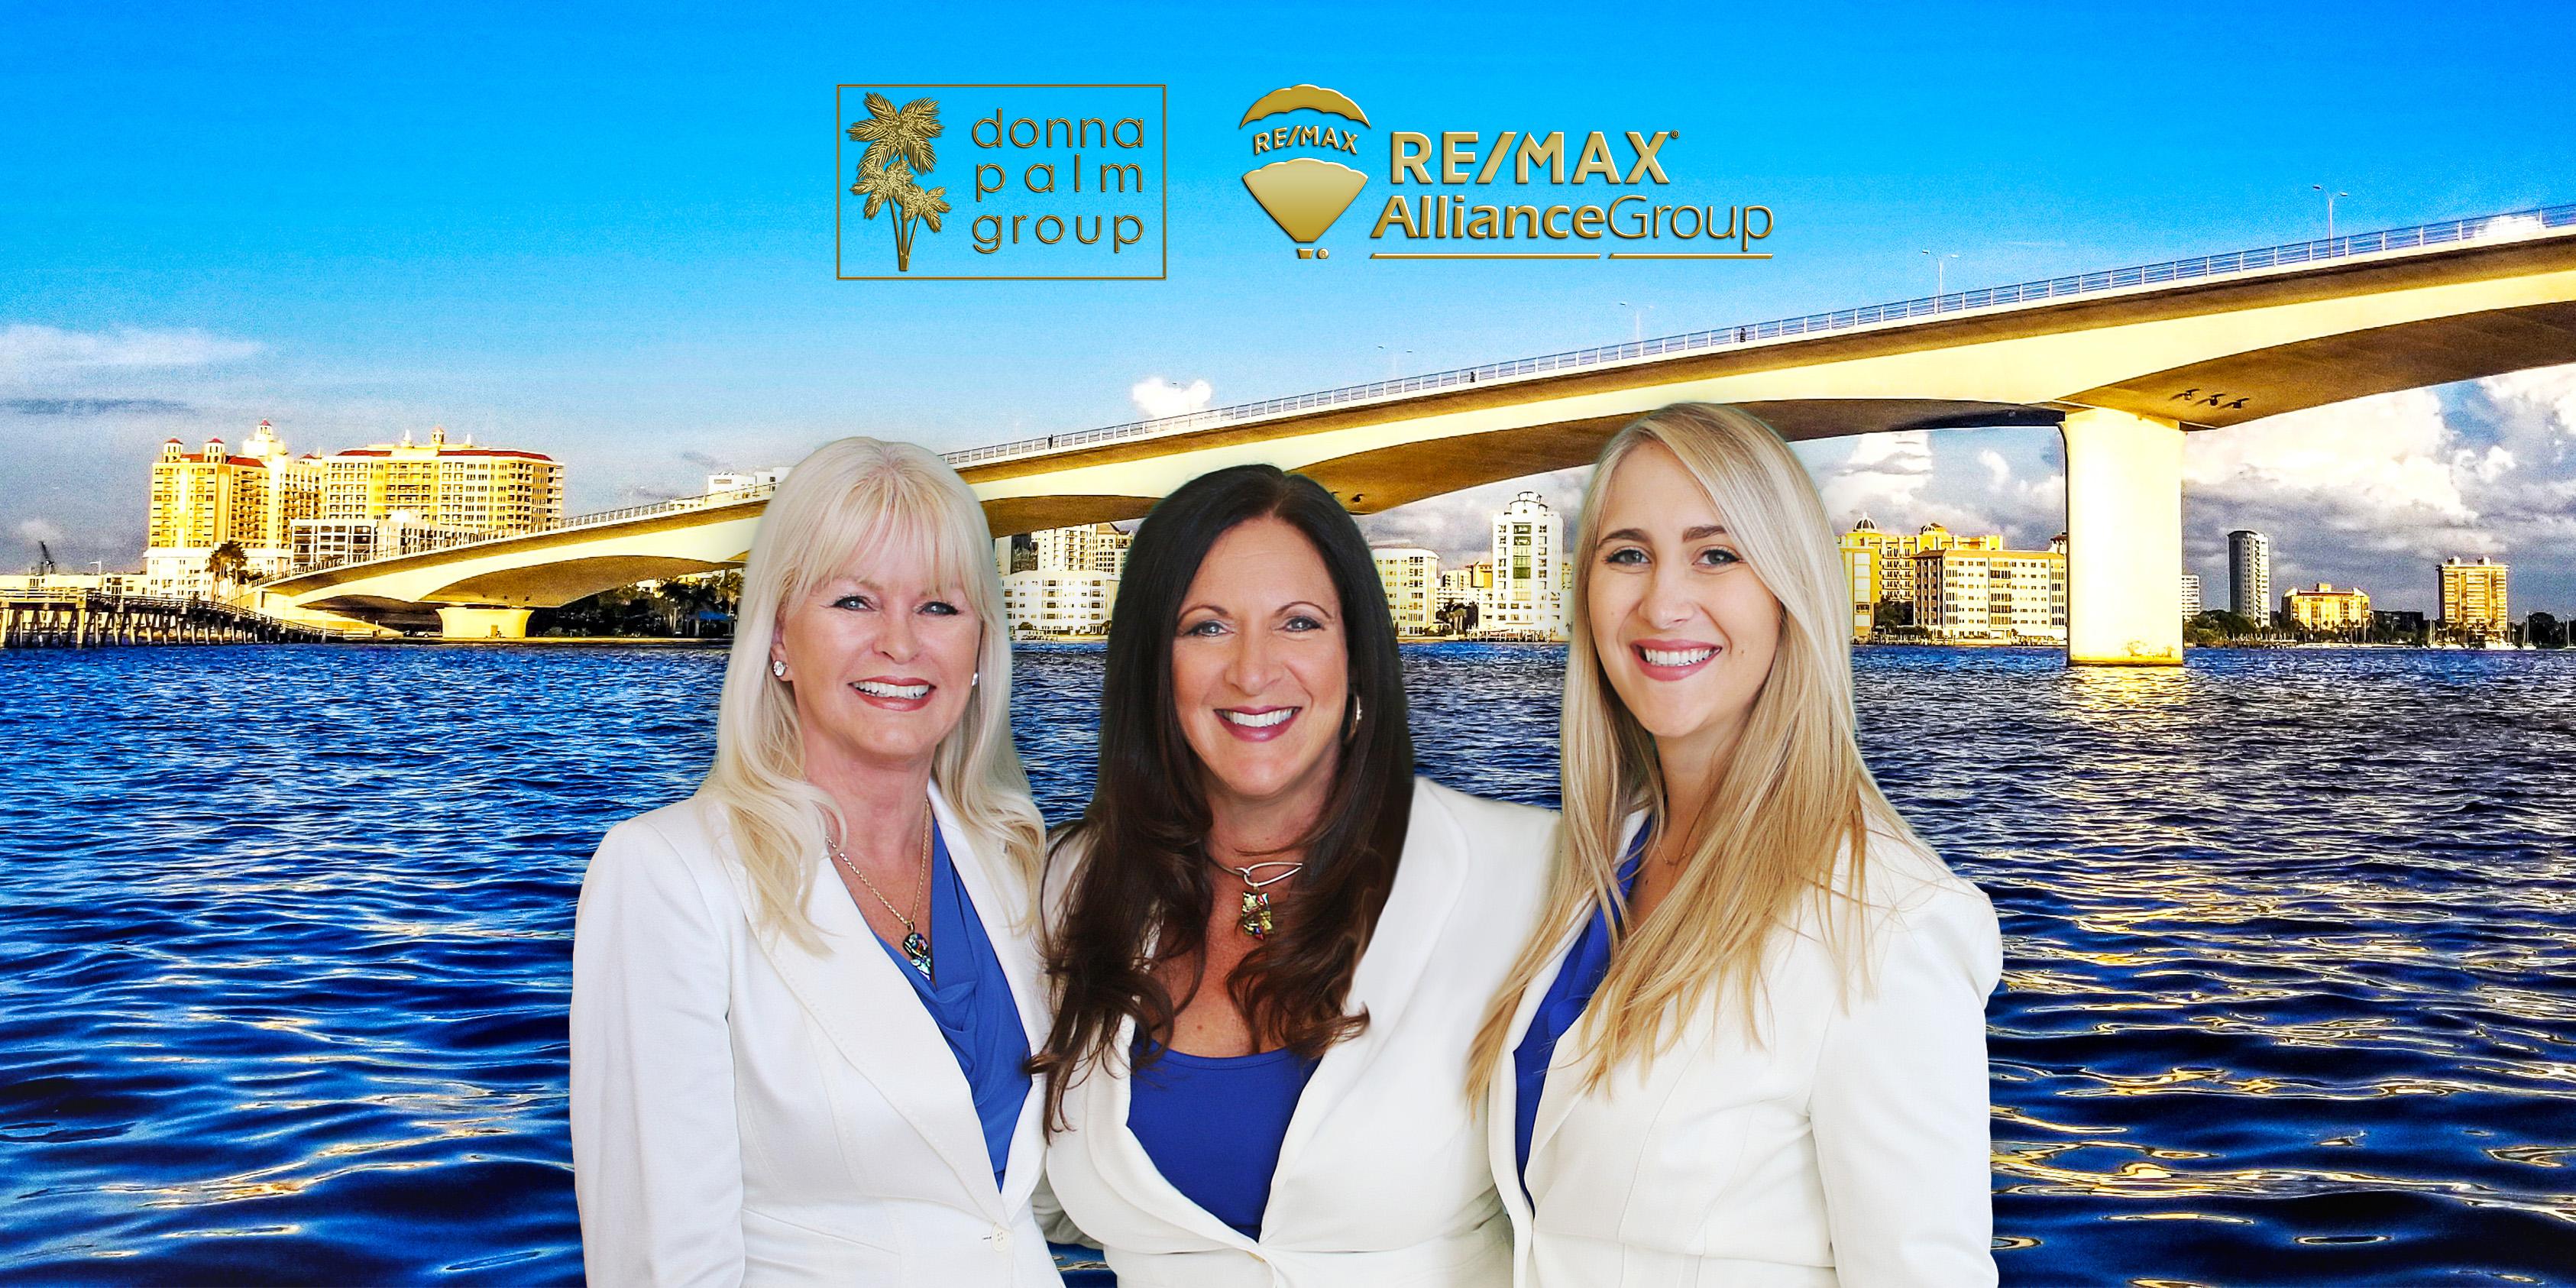 Donna Palm Group